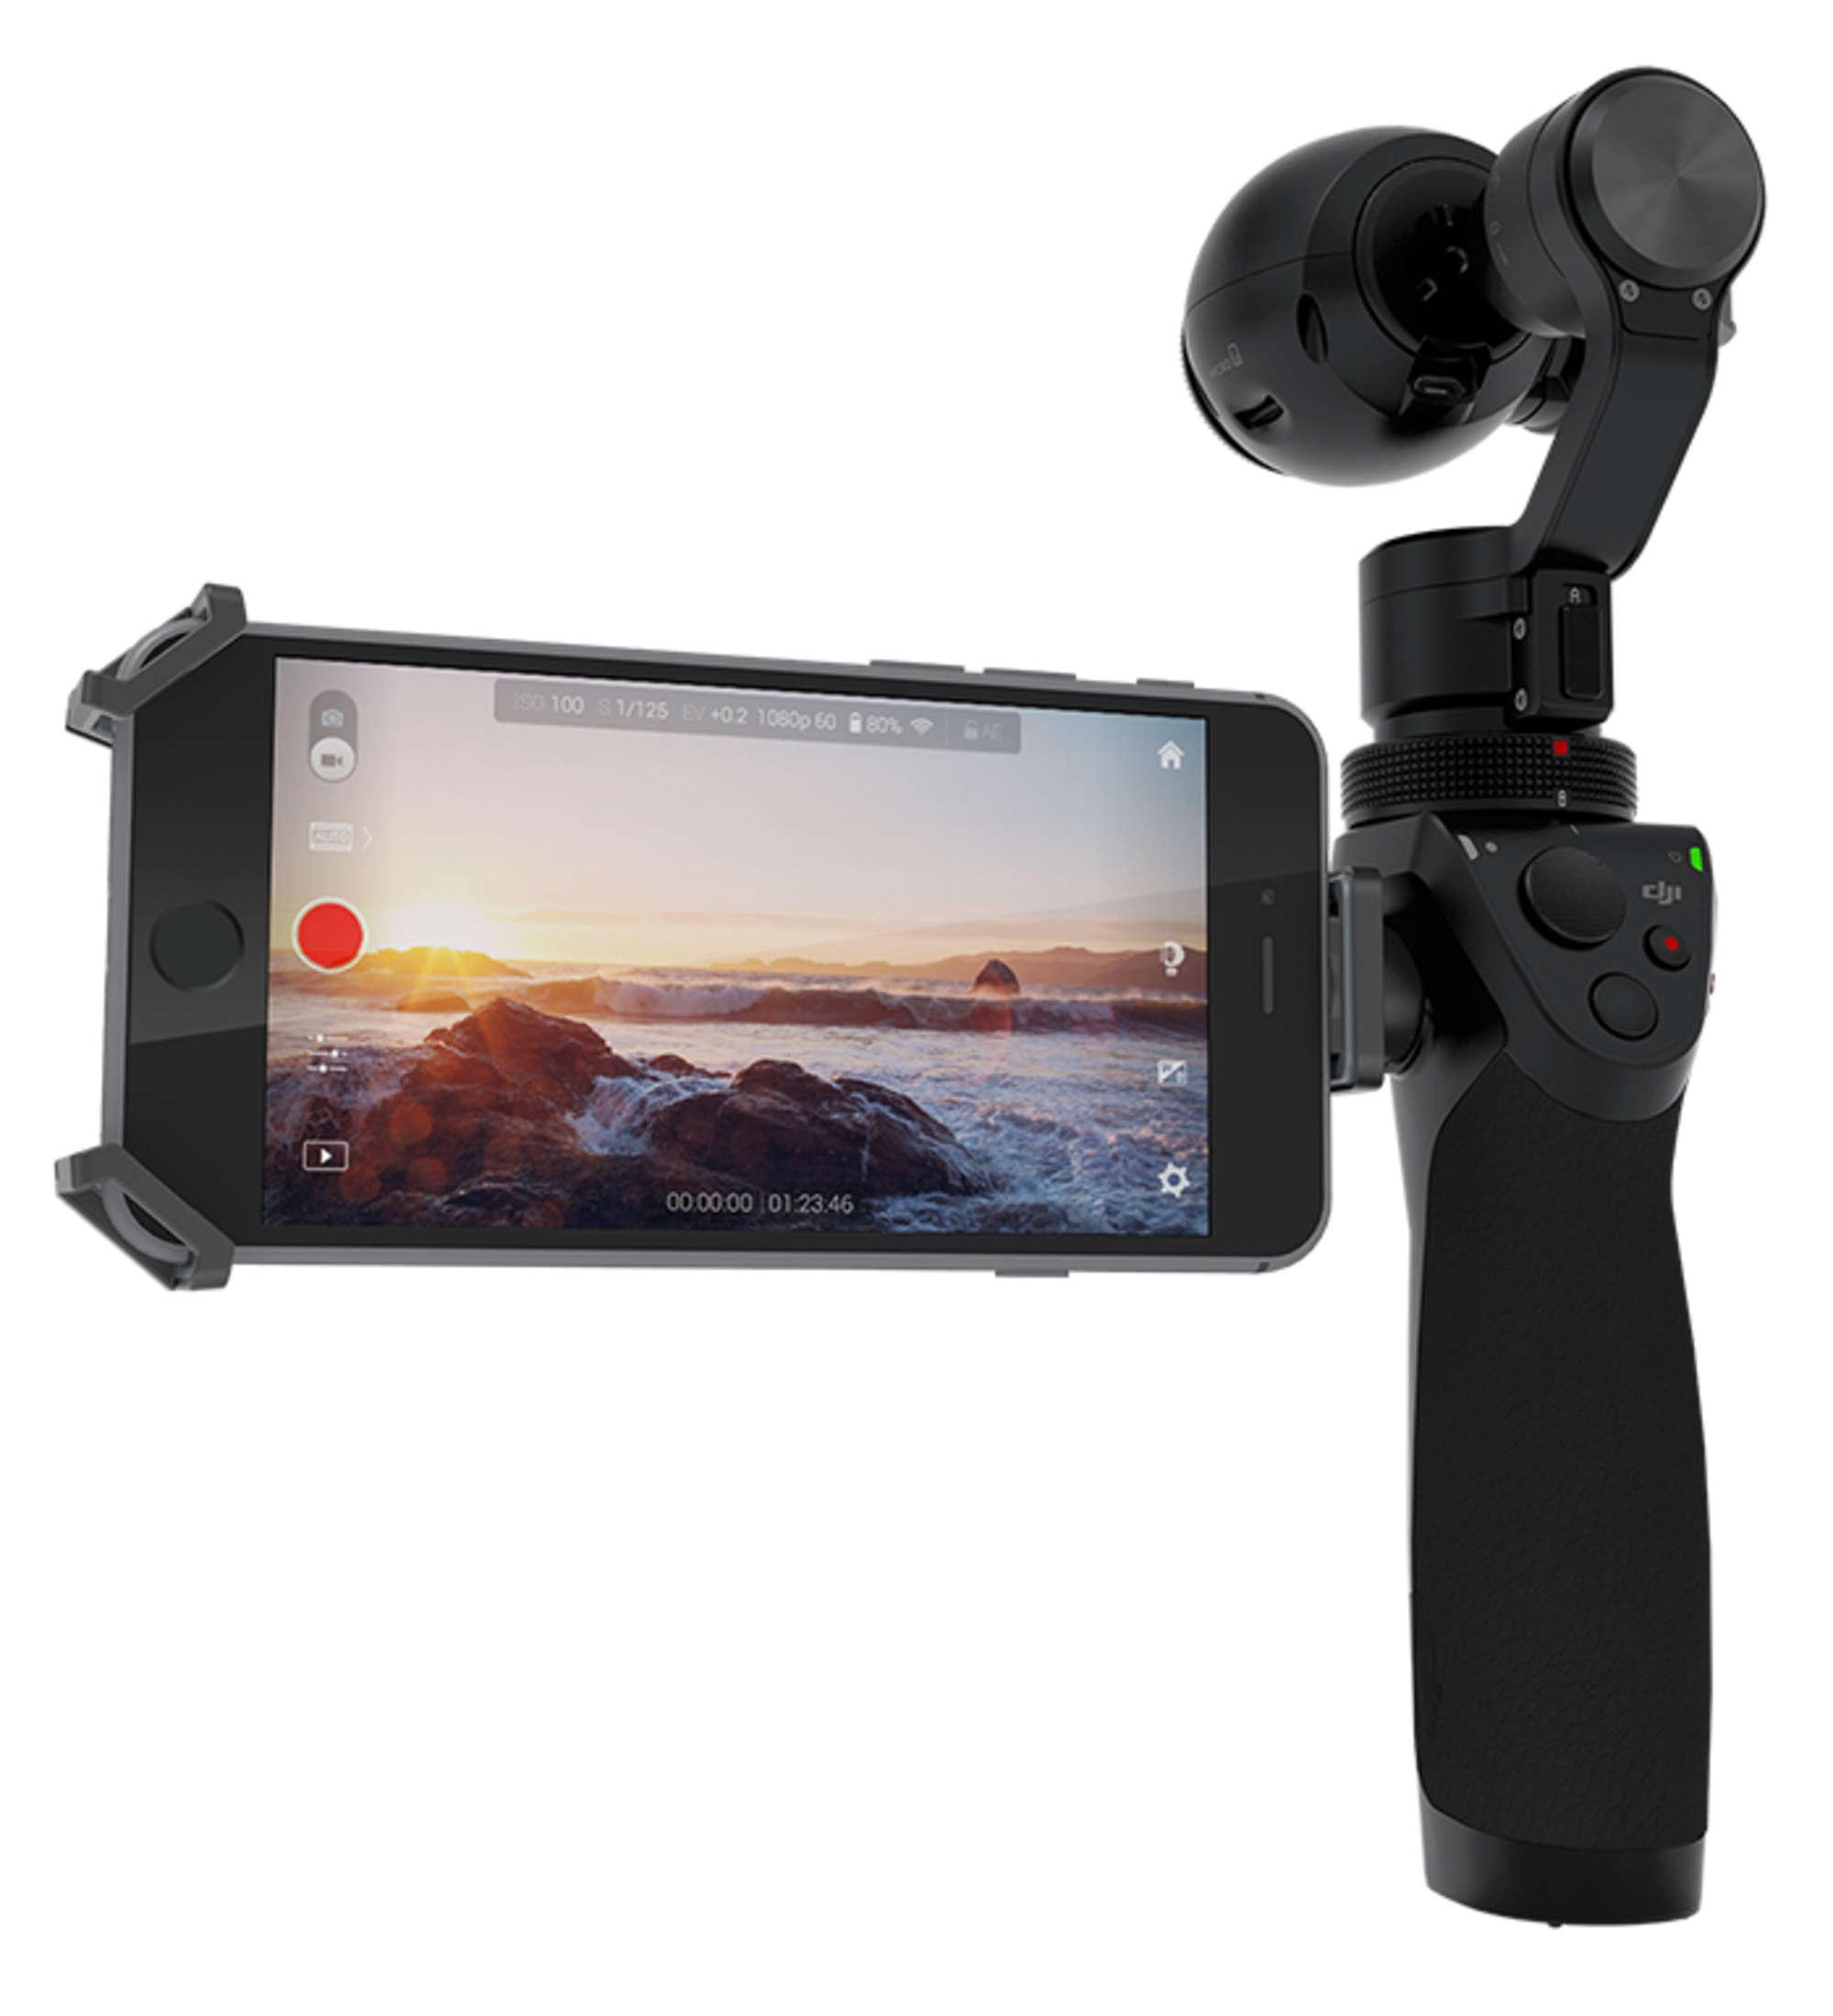 woningvideo camera